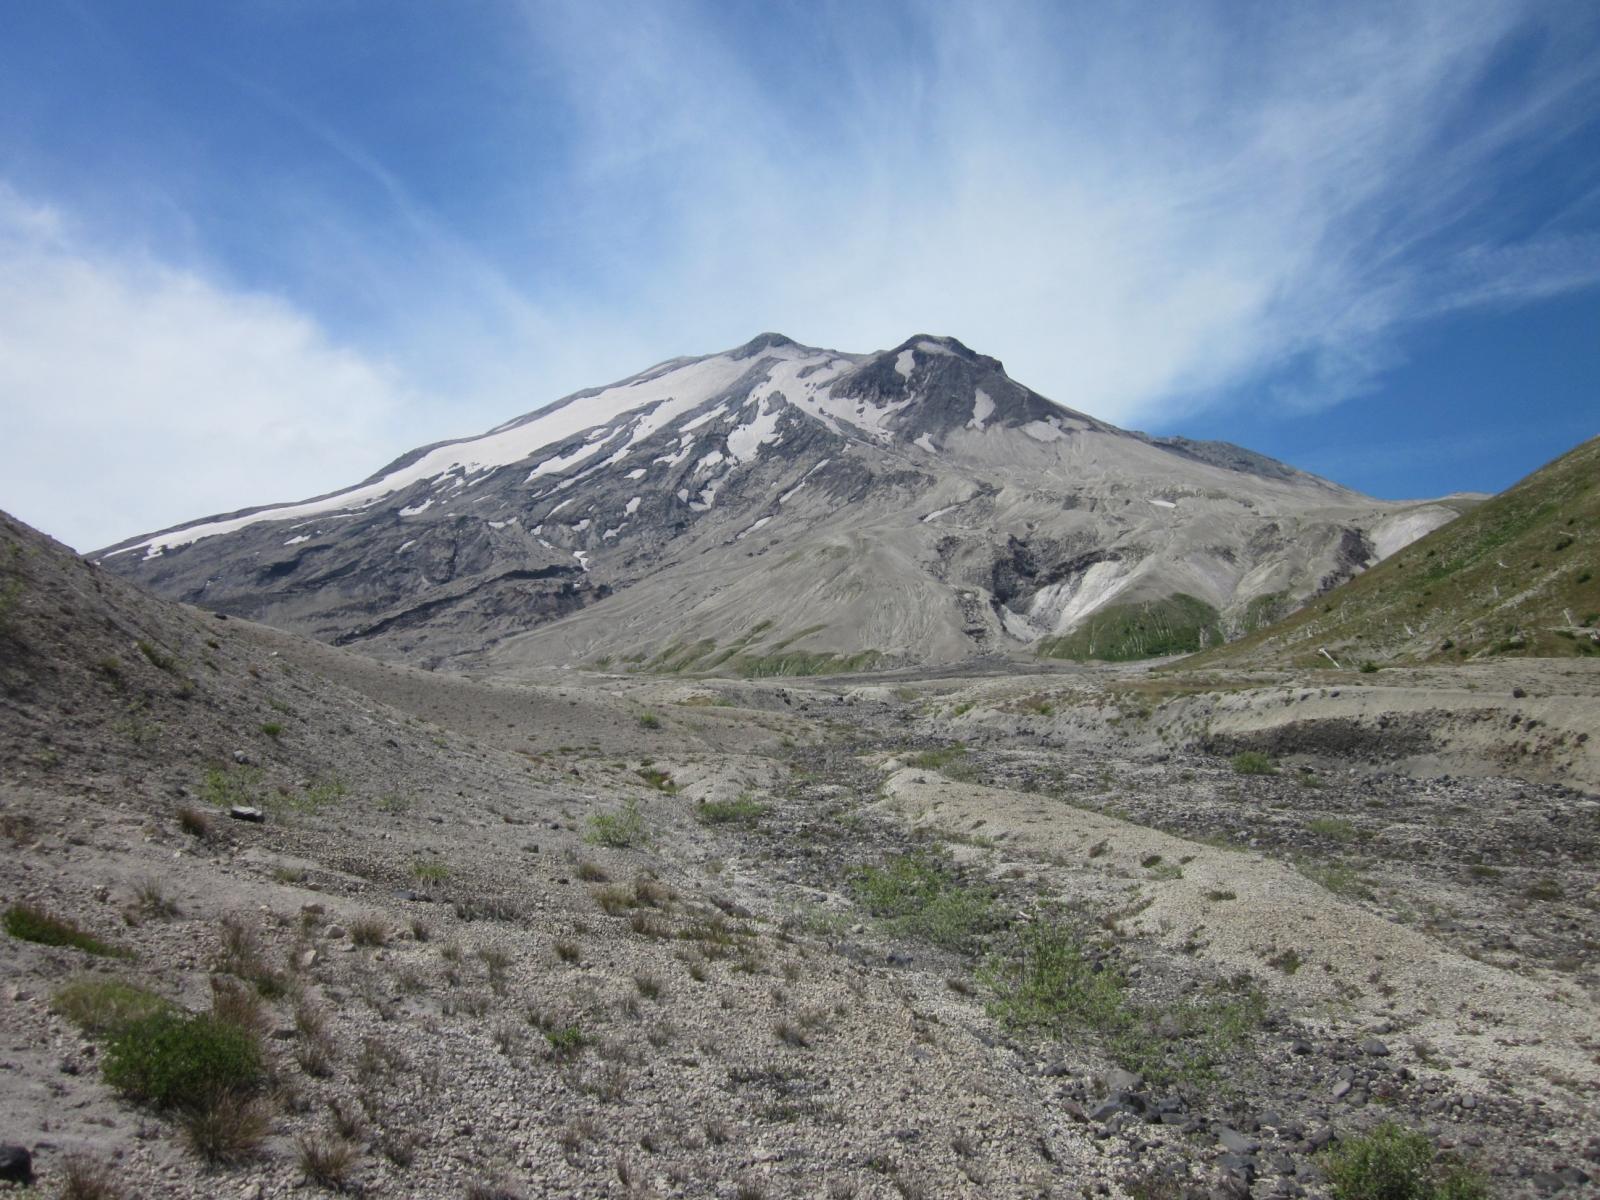 Mount St. Helens, Washington: Address, Phone Number, Mount St. Helens Reviews: 5/5